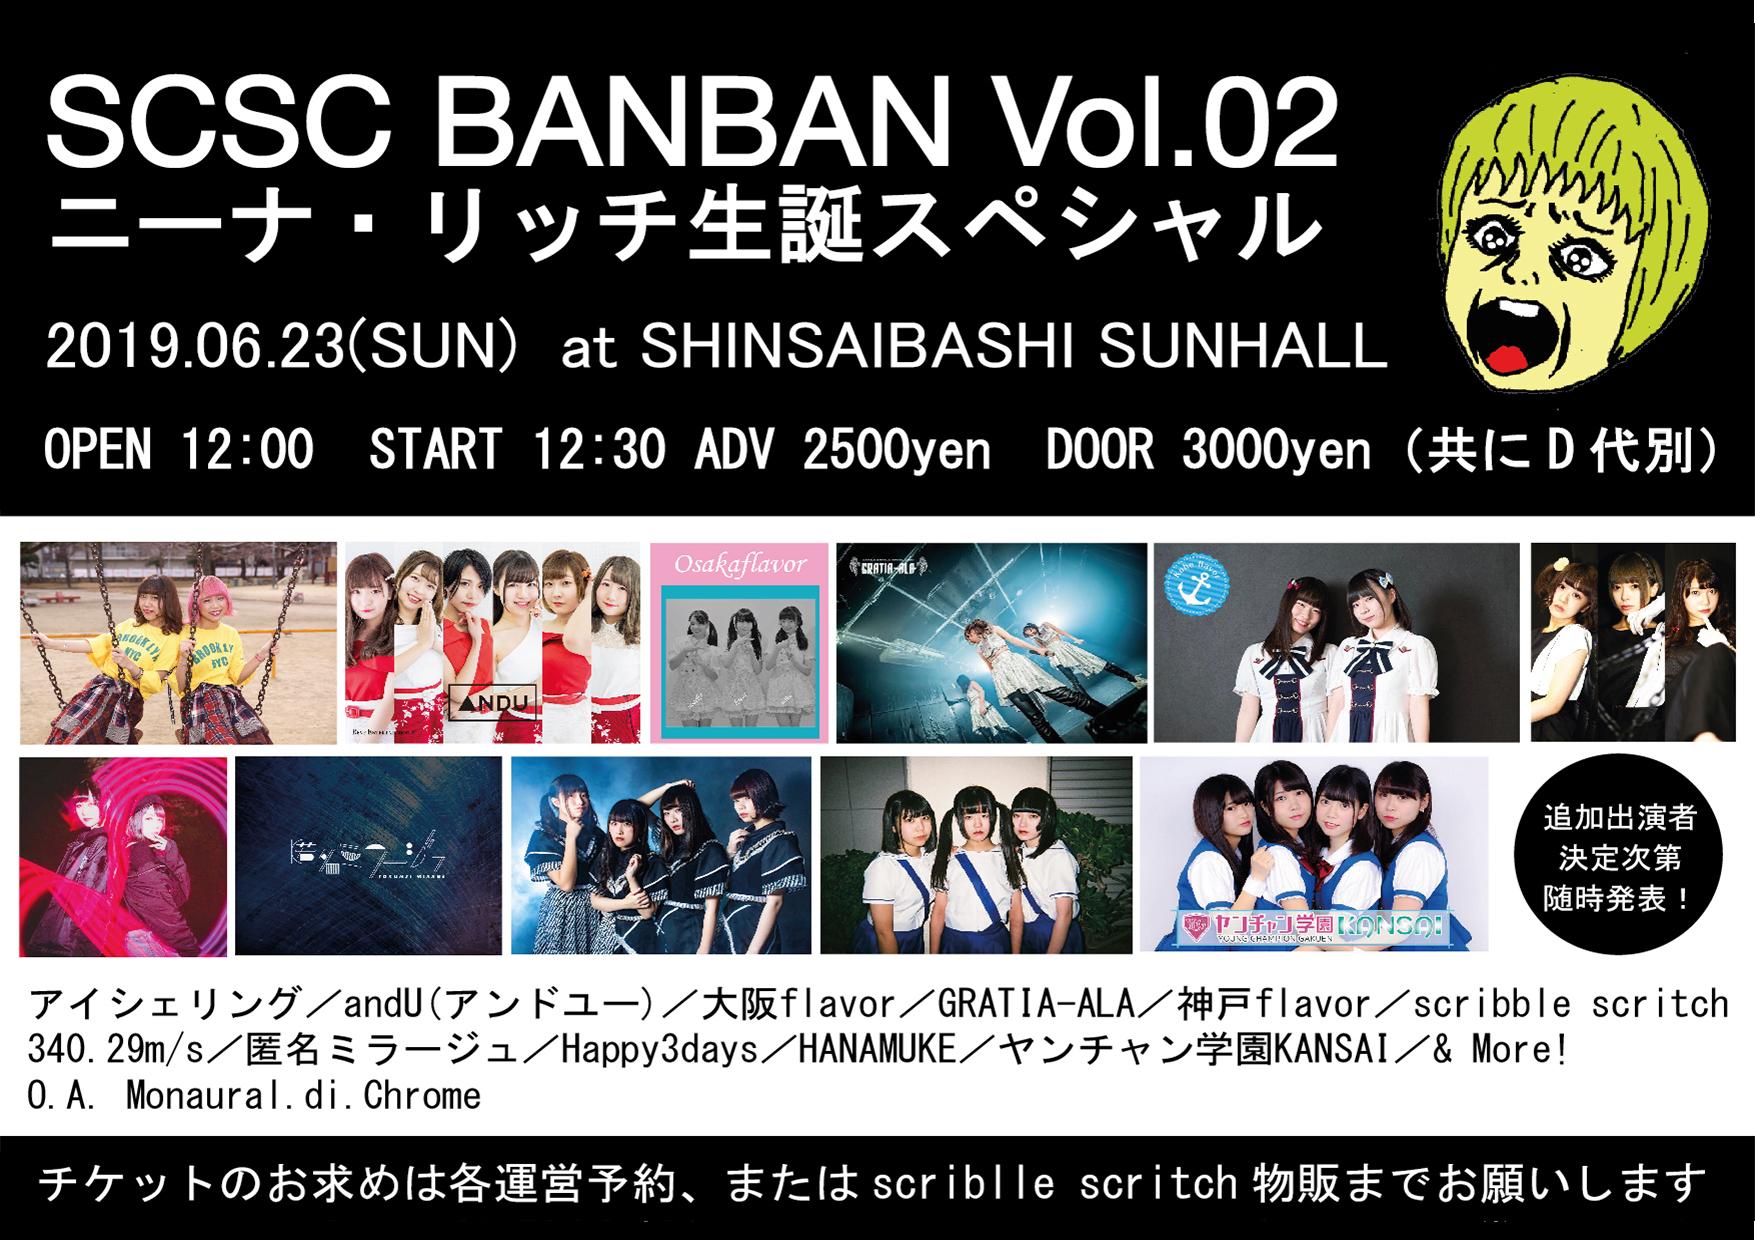 SCSC BANBAN Vol.02 ニーナ・リッチ生誕スペシャル